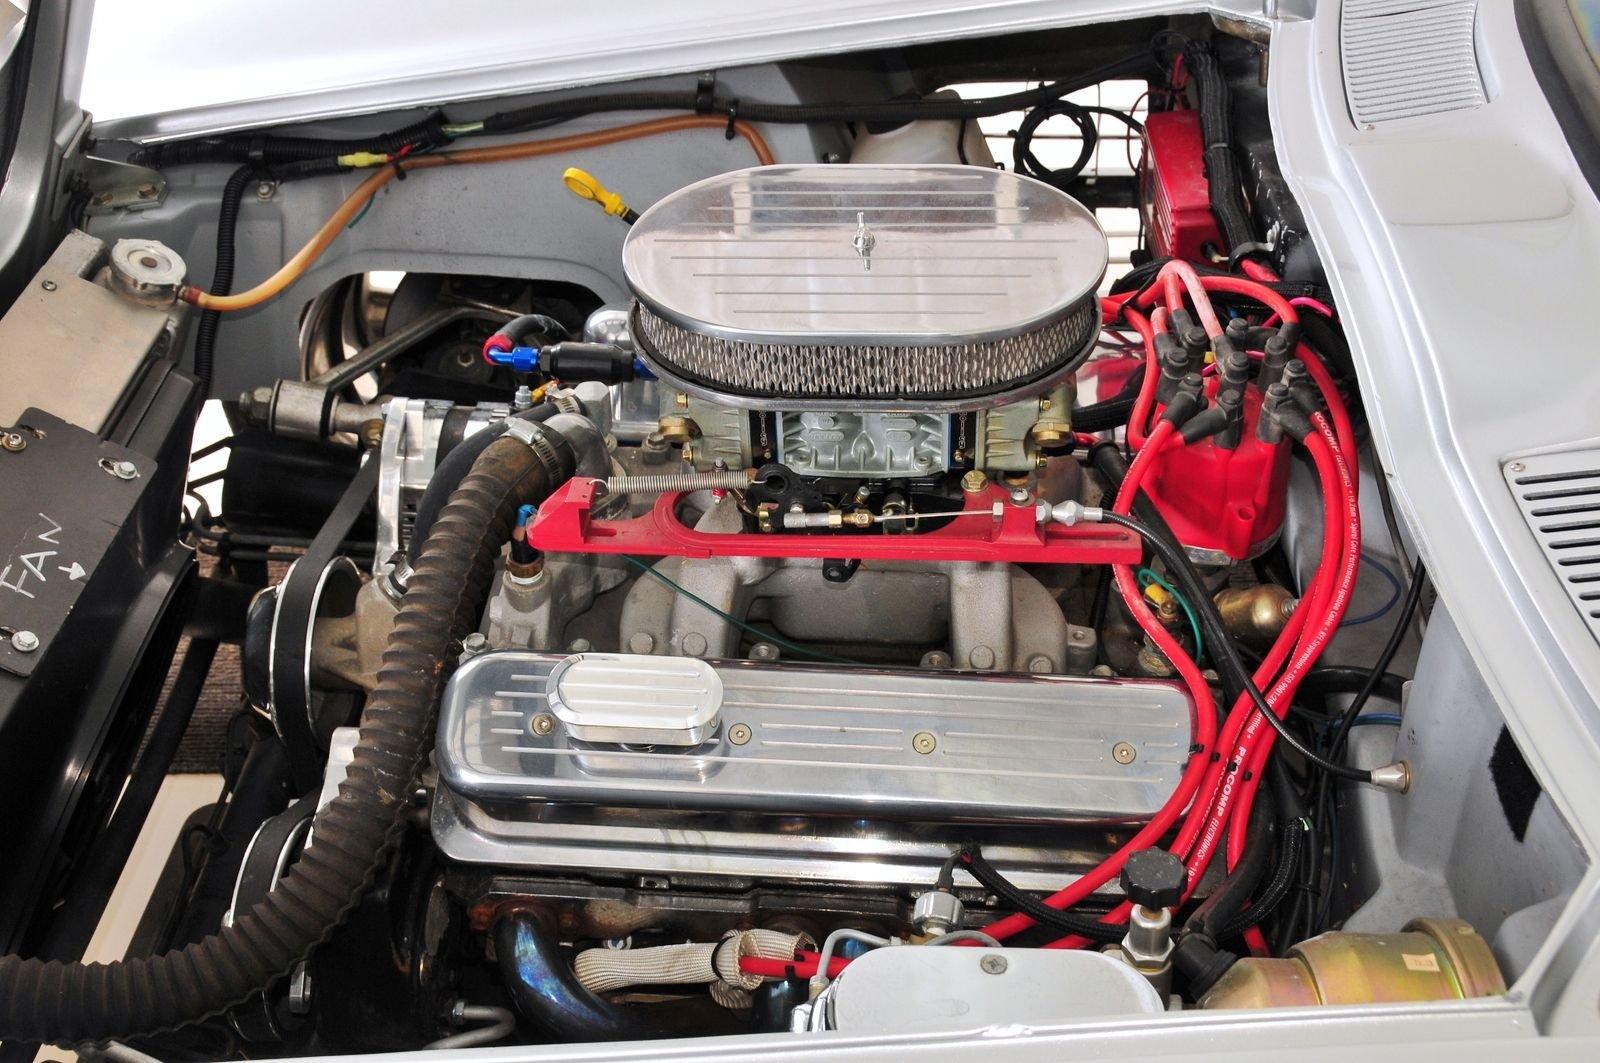 1963 Chevrolet Corvette Mongoose Motorsports Grand Sport Fast Five engine